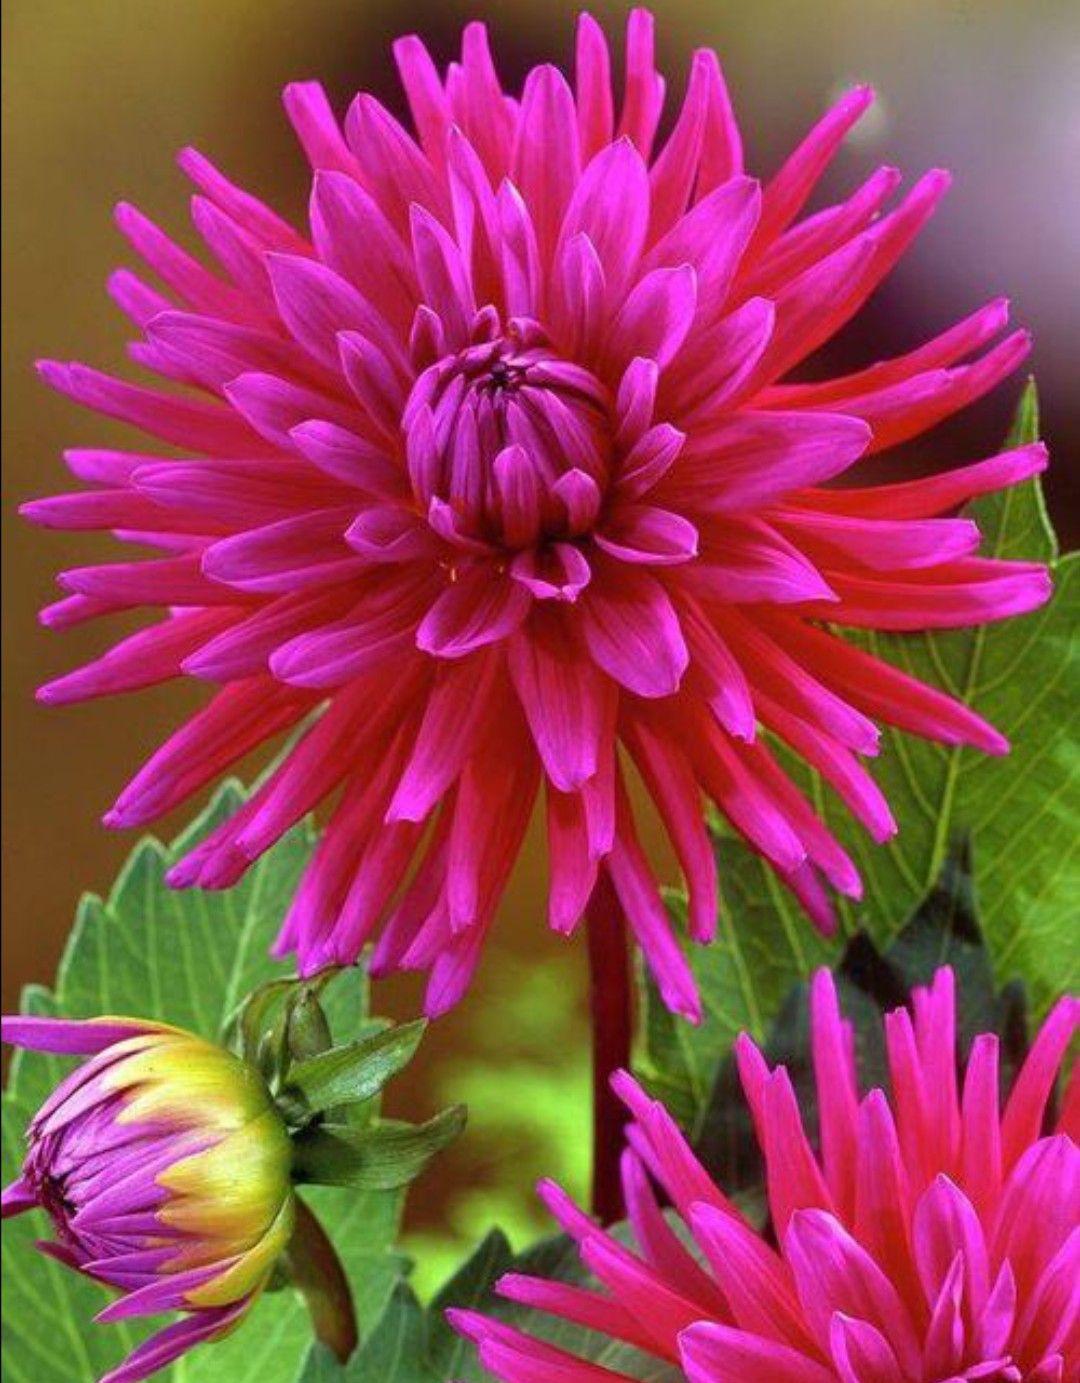 Flowers | Flowers ~☆~ | Pinterest | Flowers, Dahlia and Plants